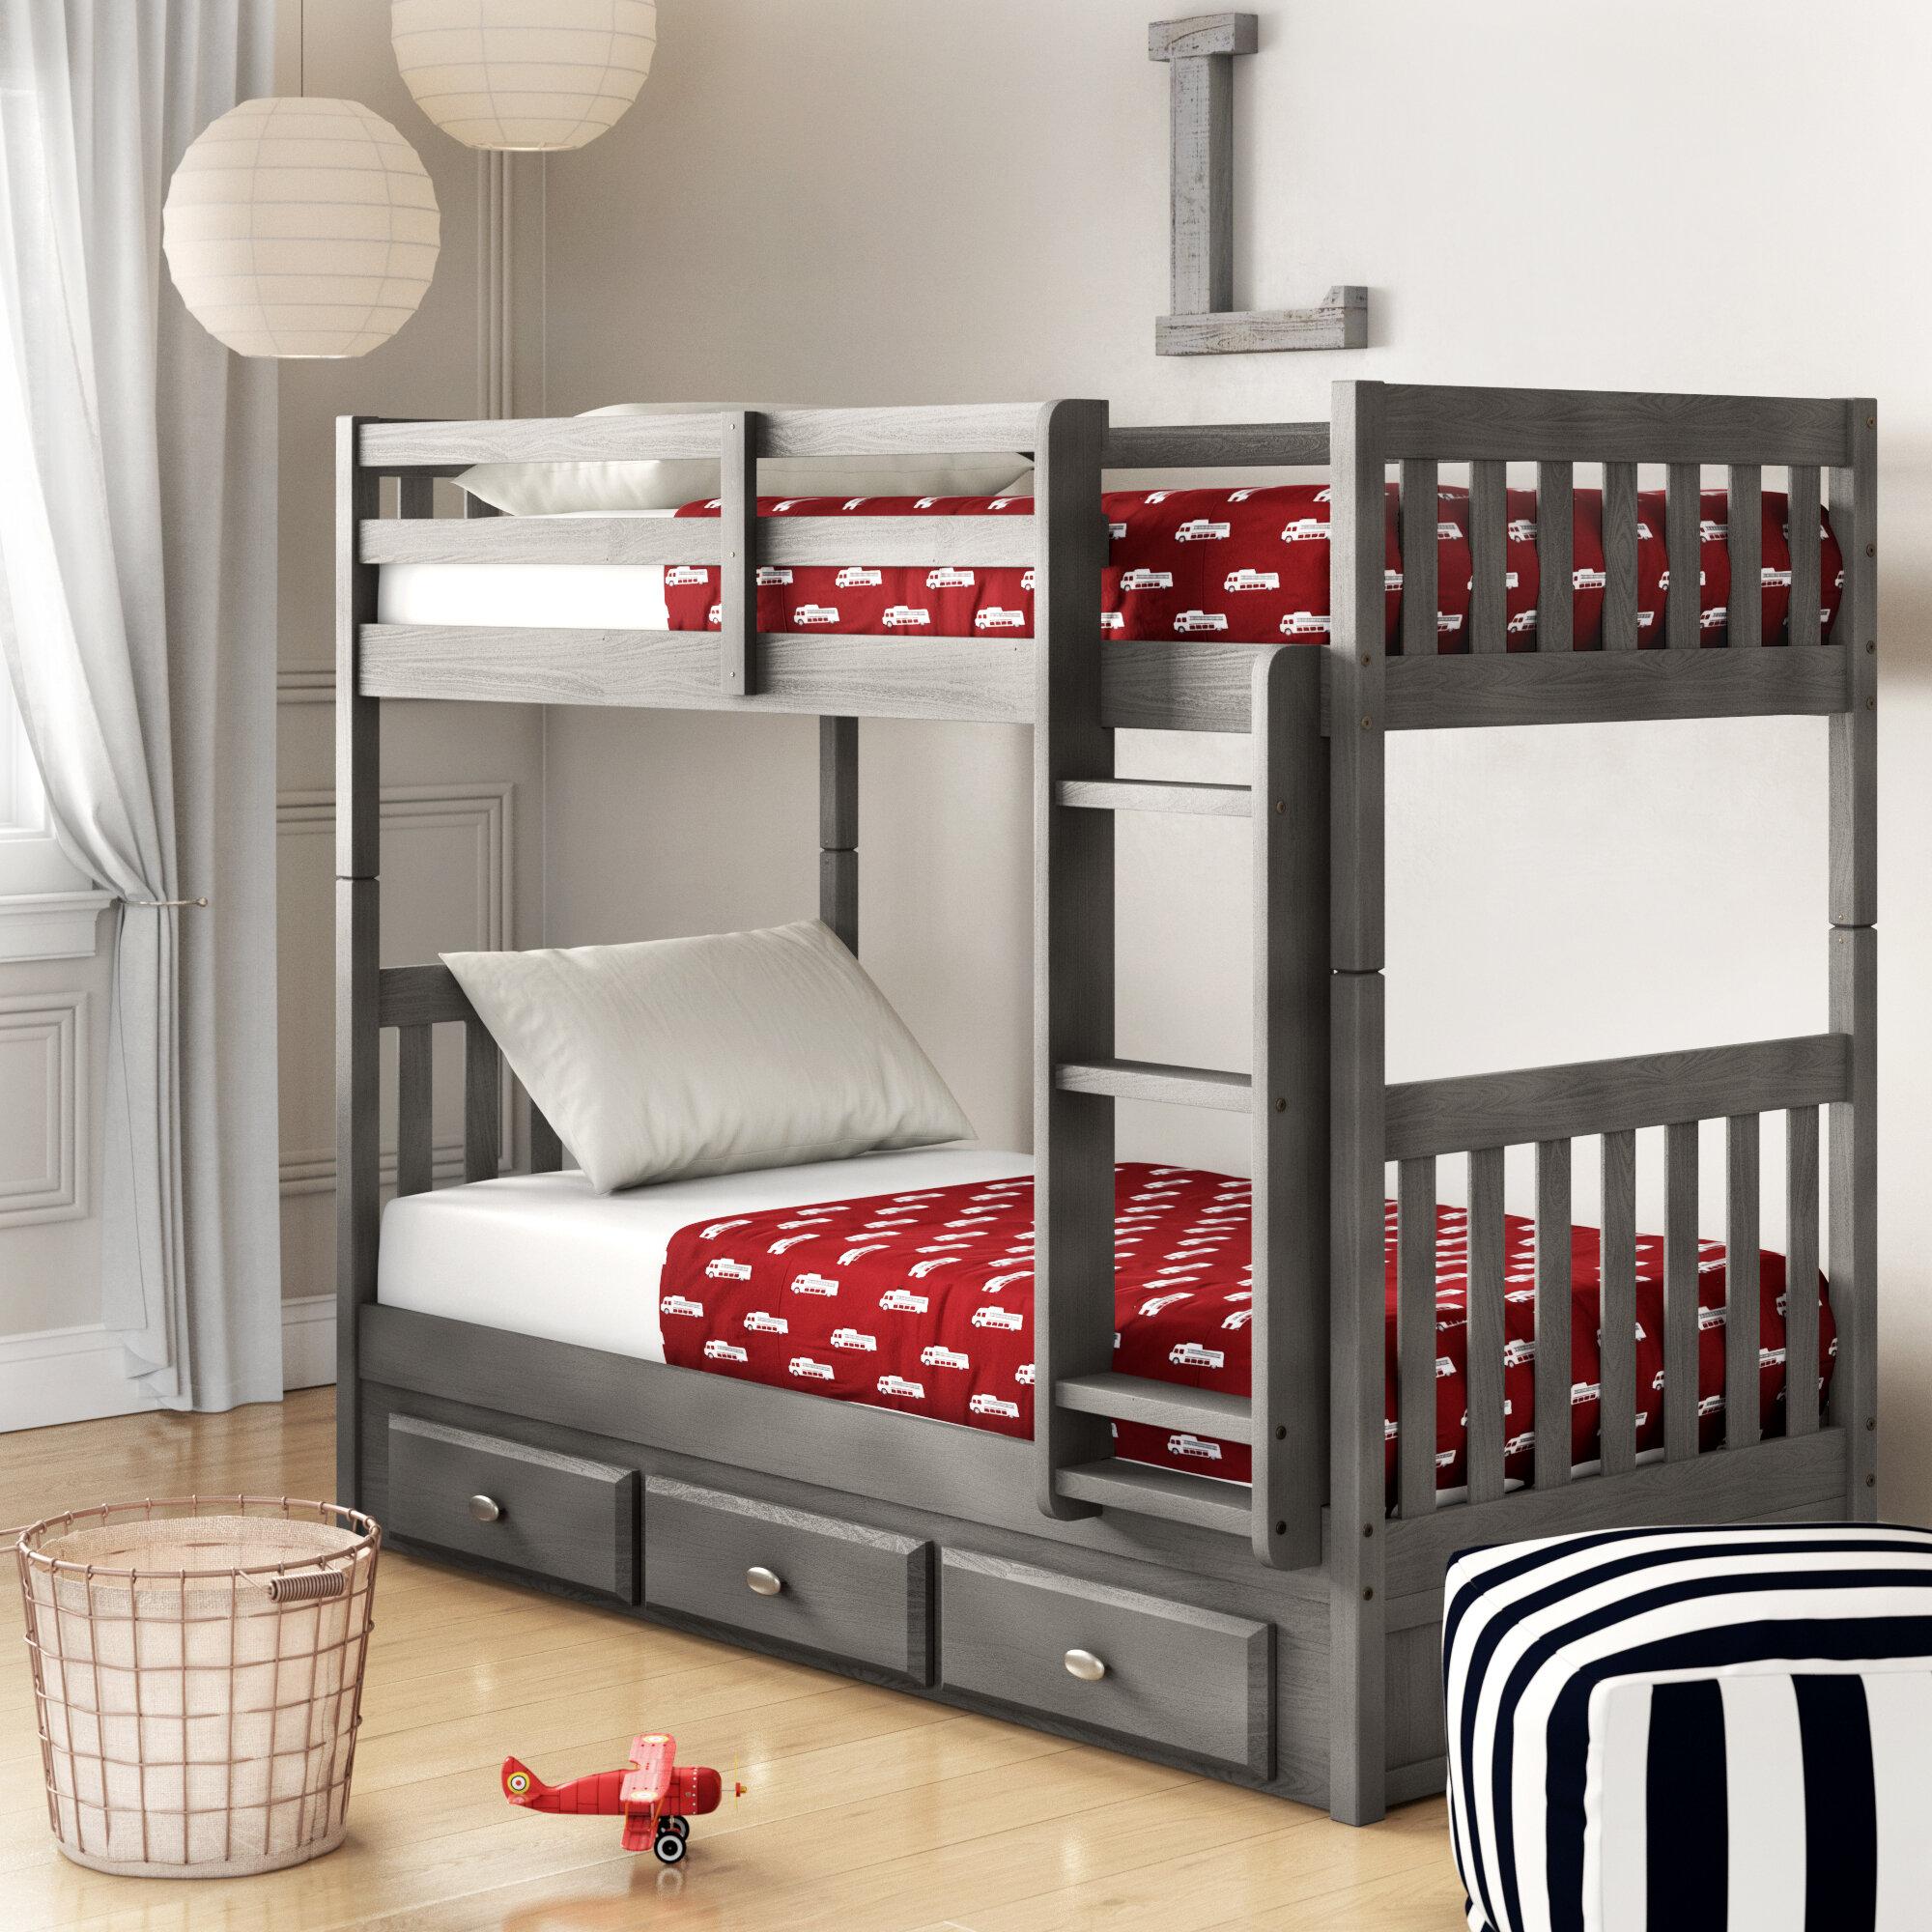 Teen Bunk Loft Beds You Ll Love In 2021 Wayfair